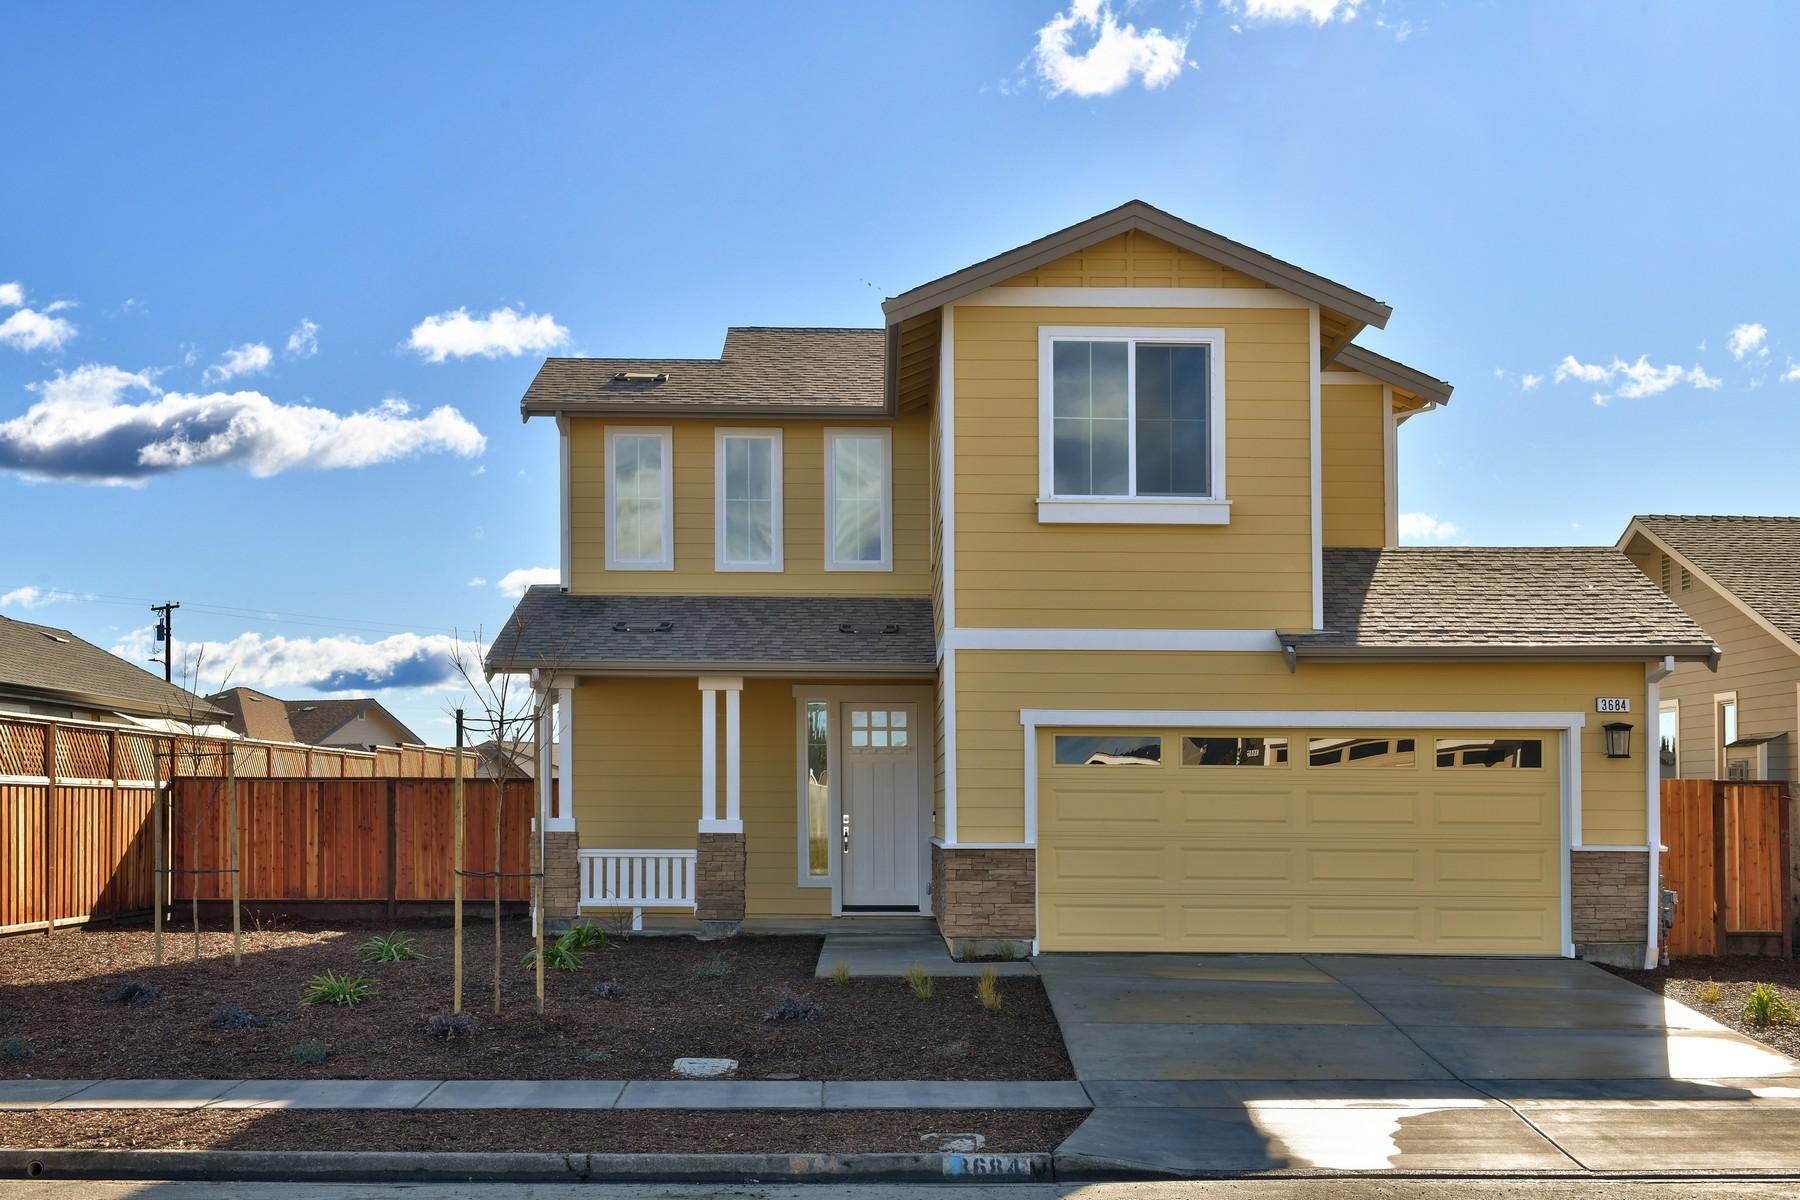 Single Family Homes for Sale at Coffey Park 3684 Hemlock Street Santa Rosa, California 95403 United States